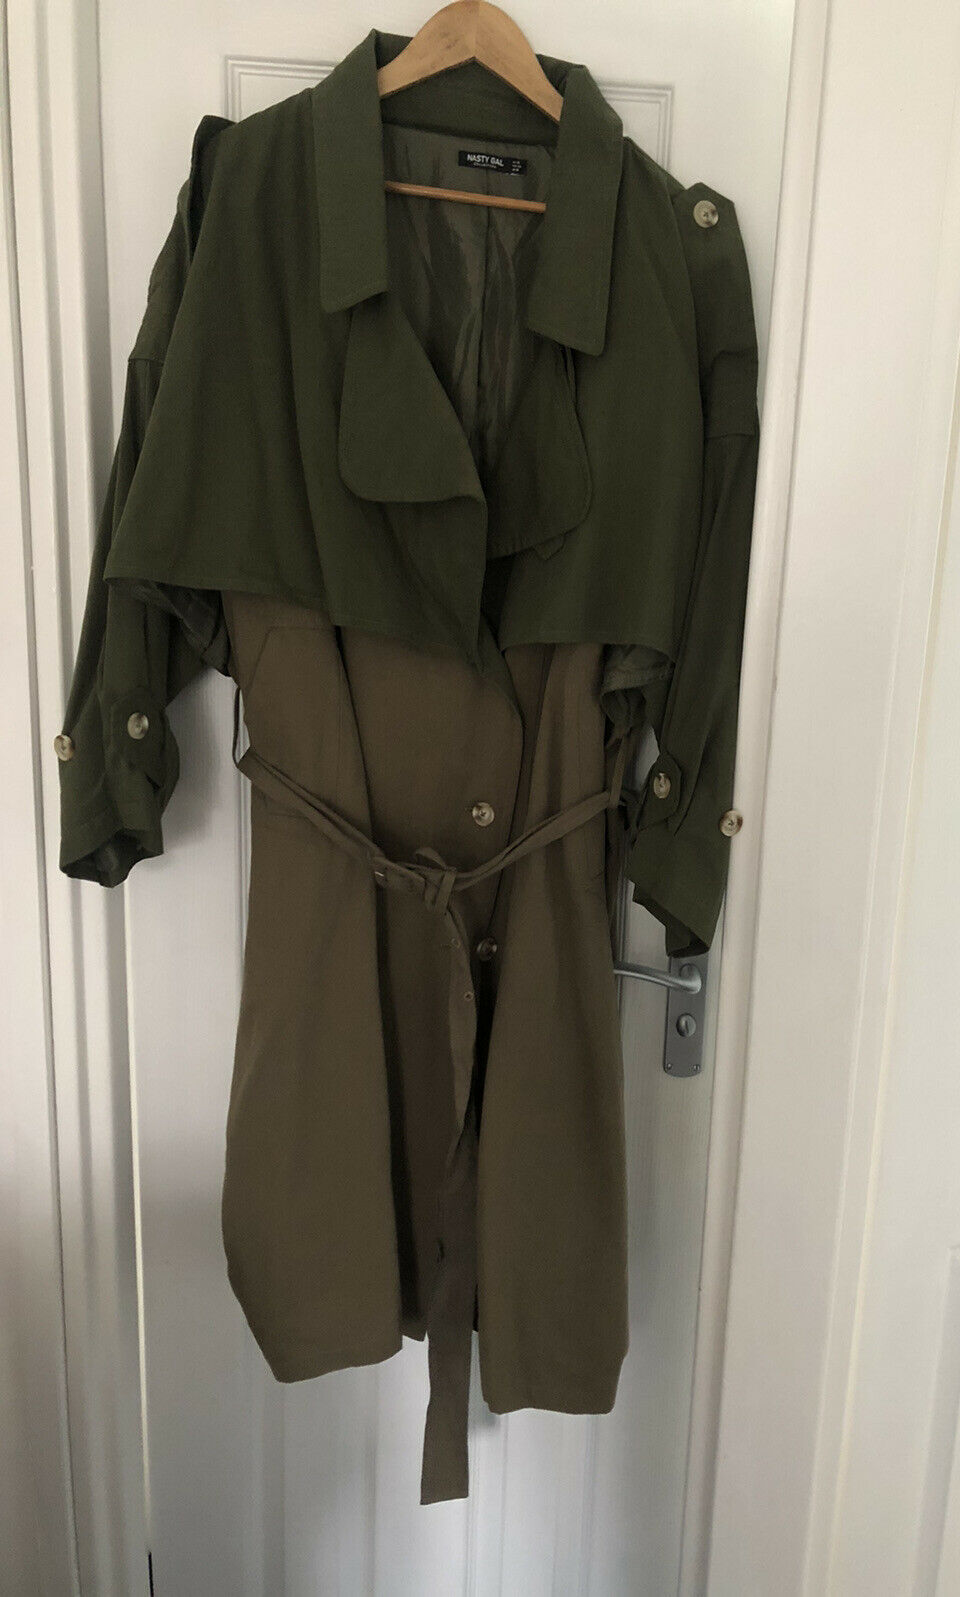 Nasty gal Army Green Khaki Trench Coat Oversized Long Lightweight Size Uk 16